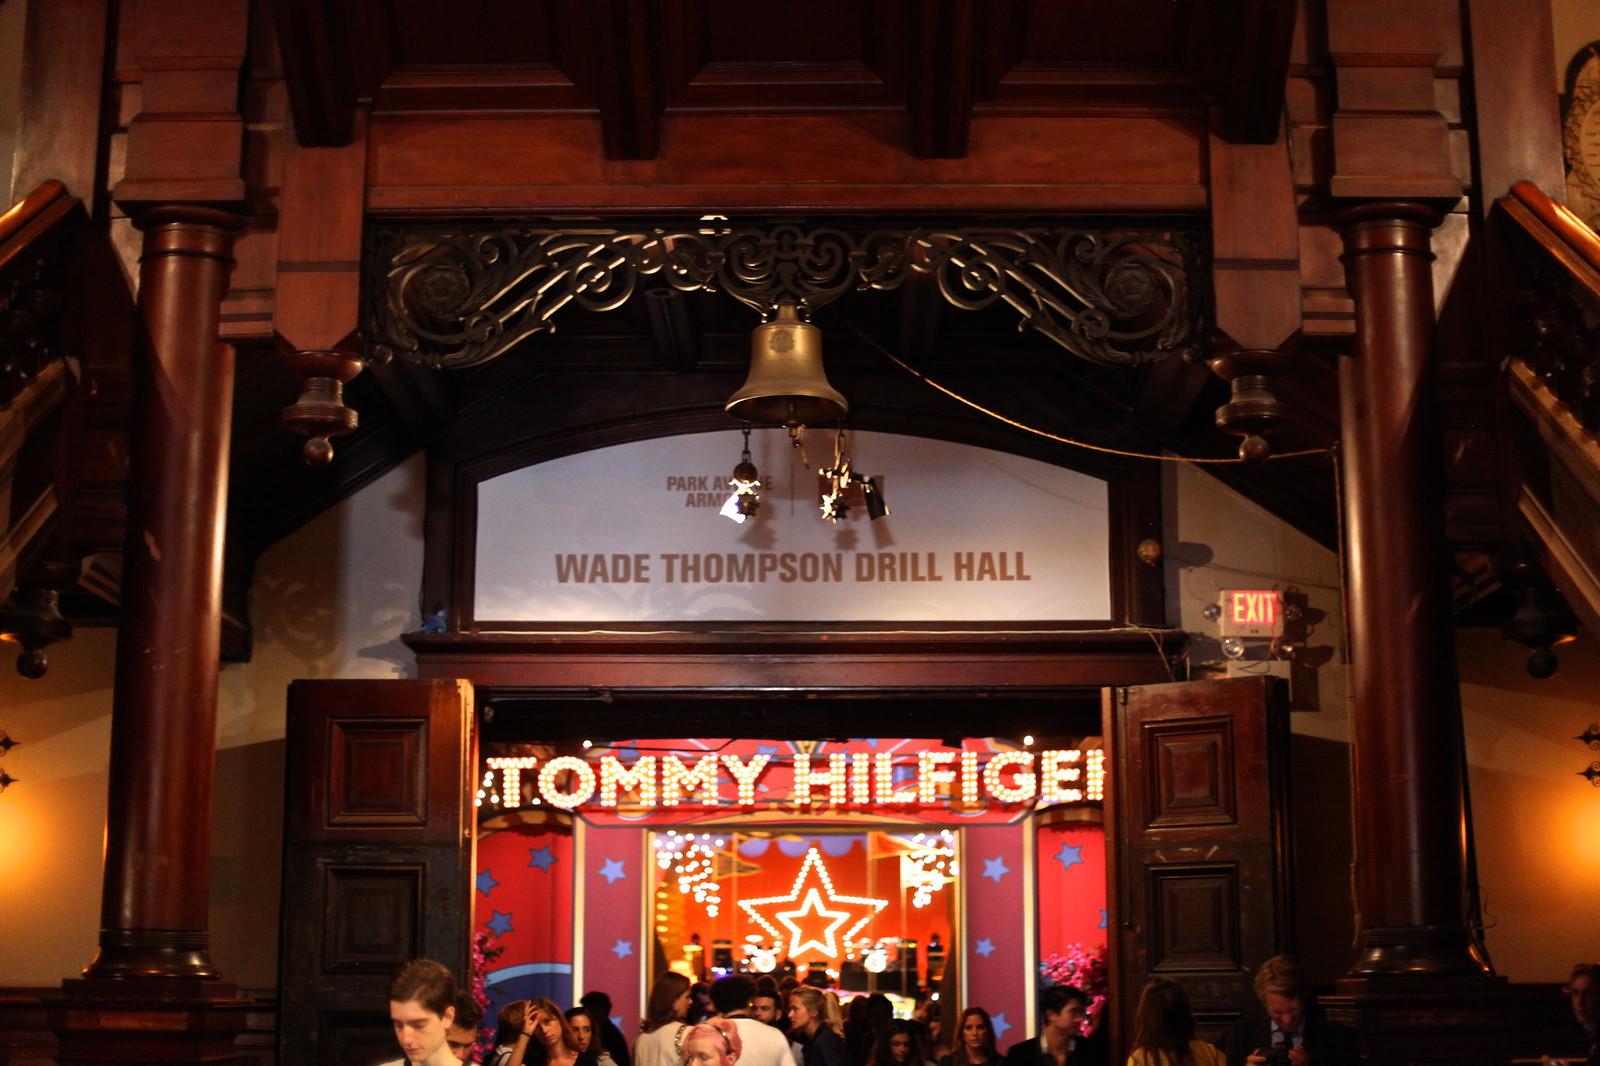 Tommy_hilfiger_show_manlul